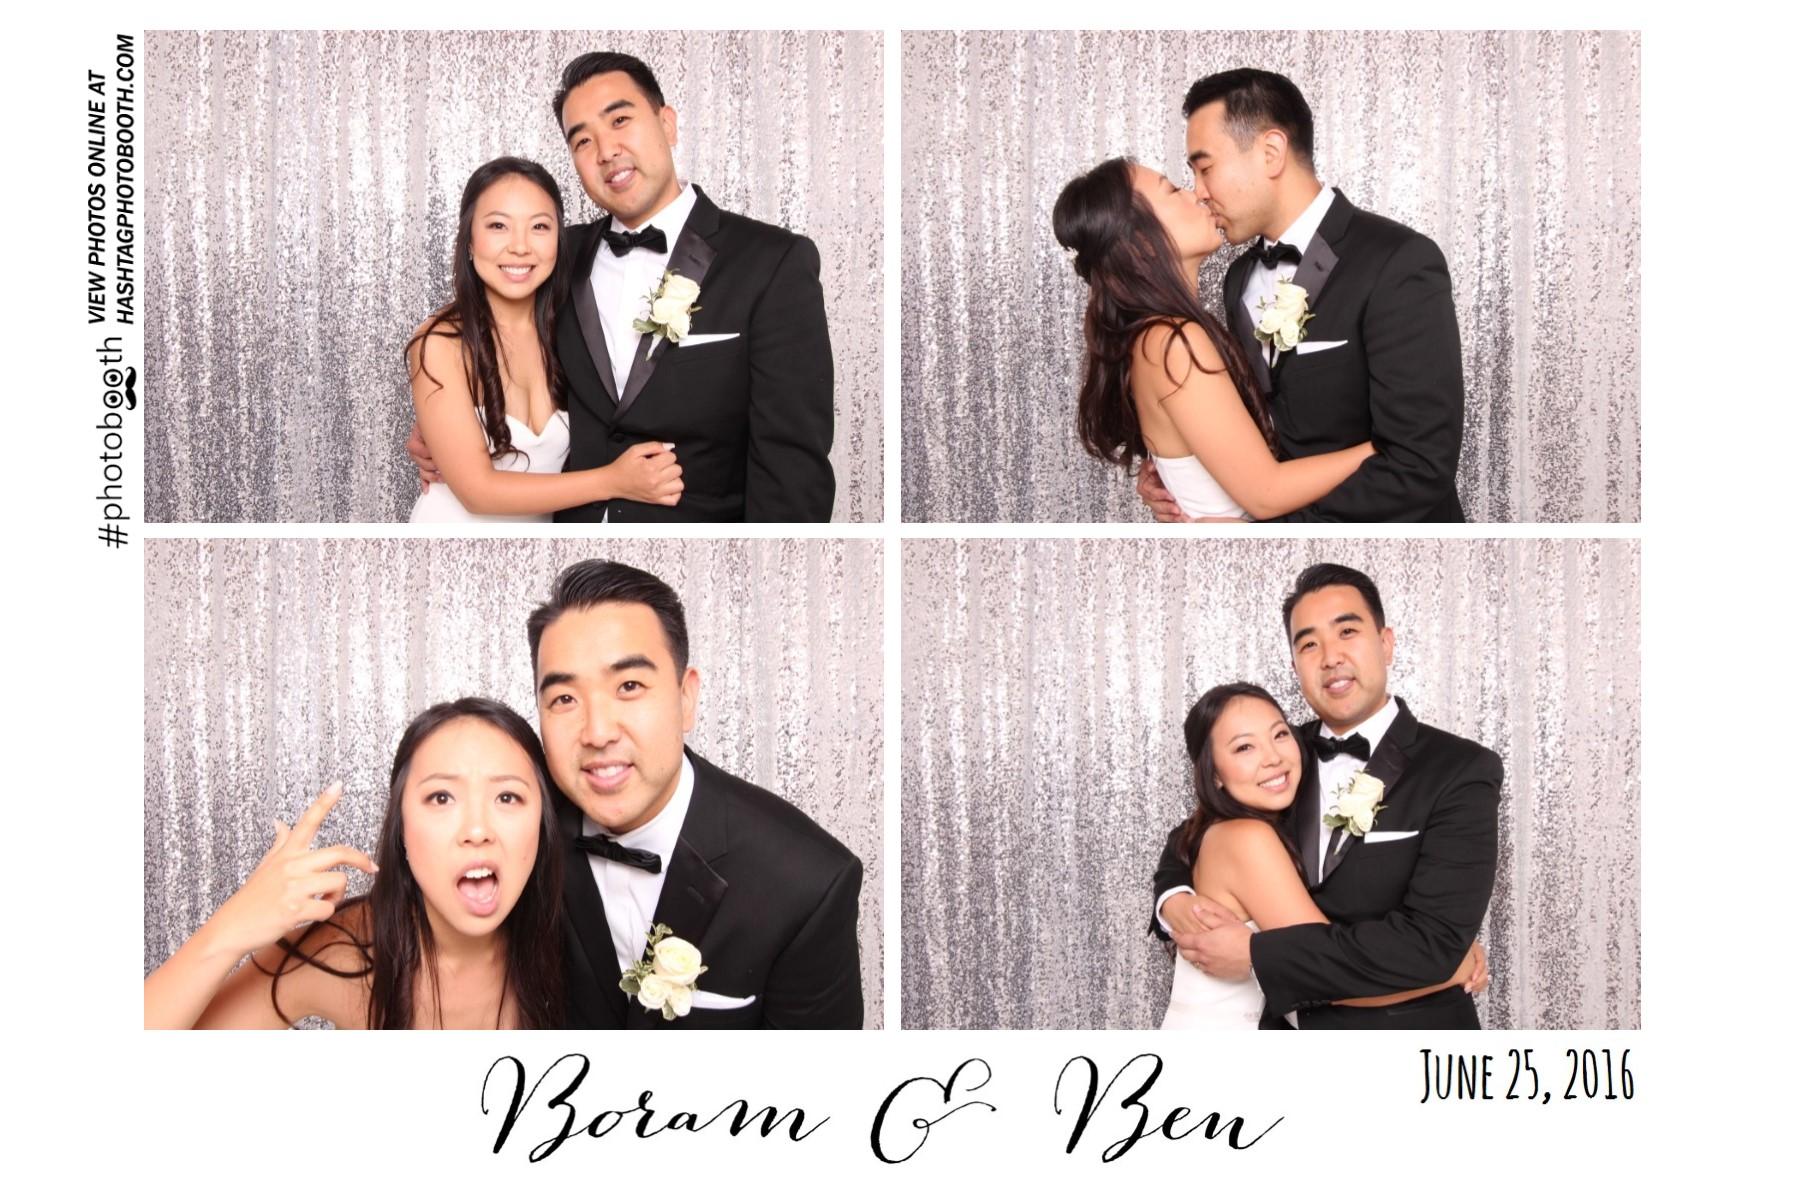 Boram & Ben